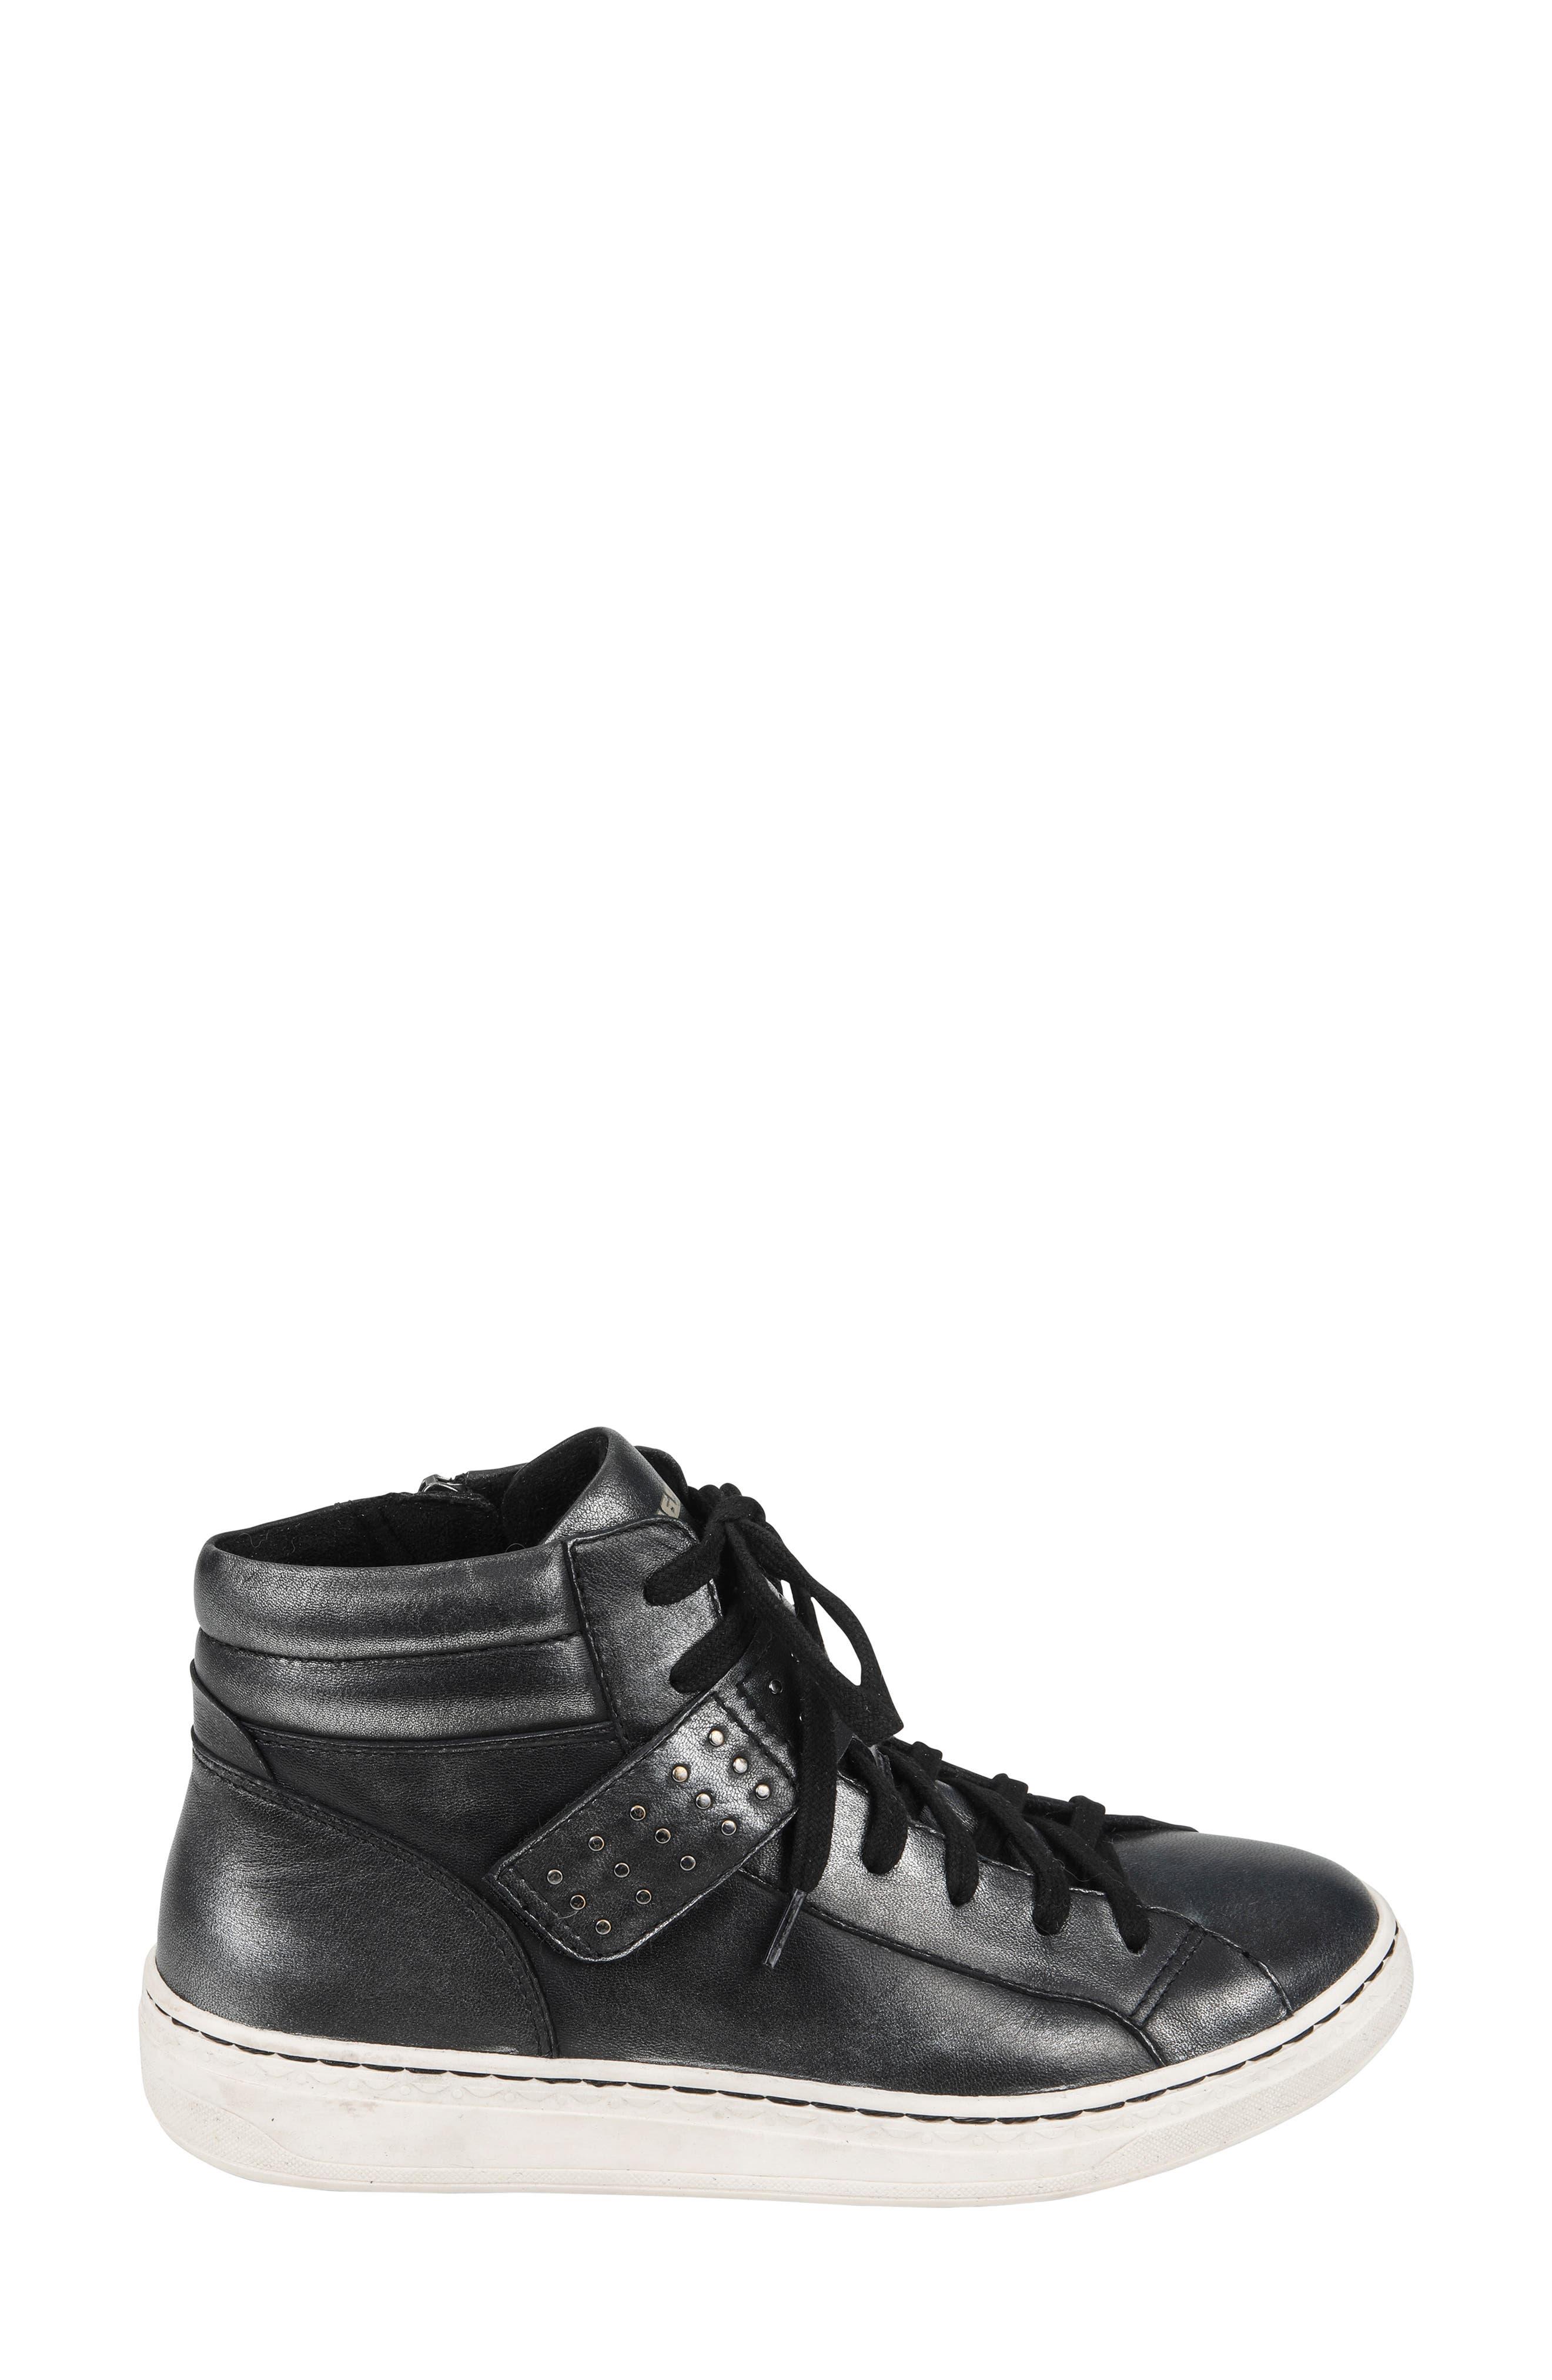 Zeal High Top Sneaker,                             Alternate thumbnail 3, color,                             BLACK METALLIC LEATHER